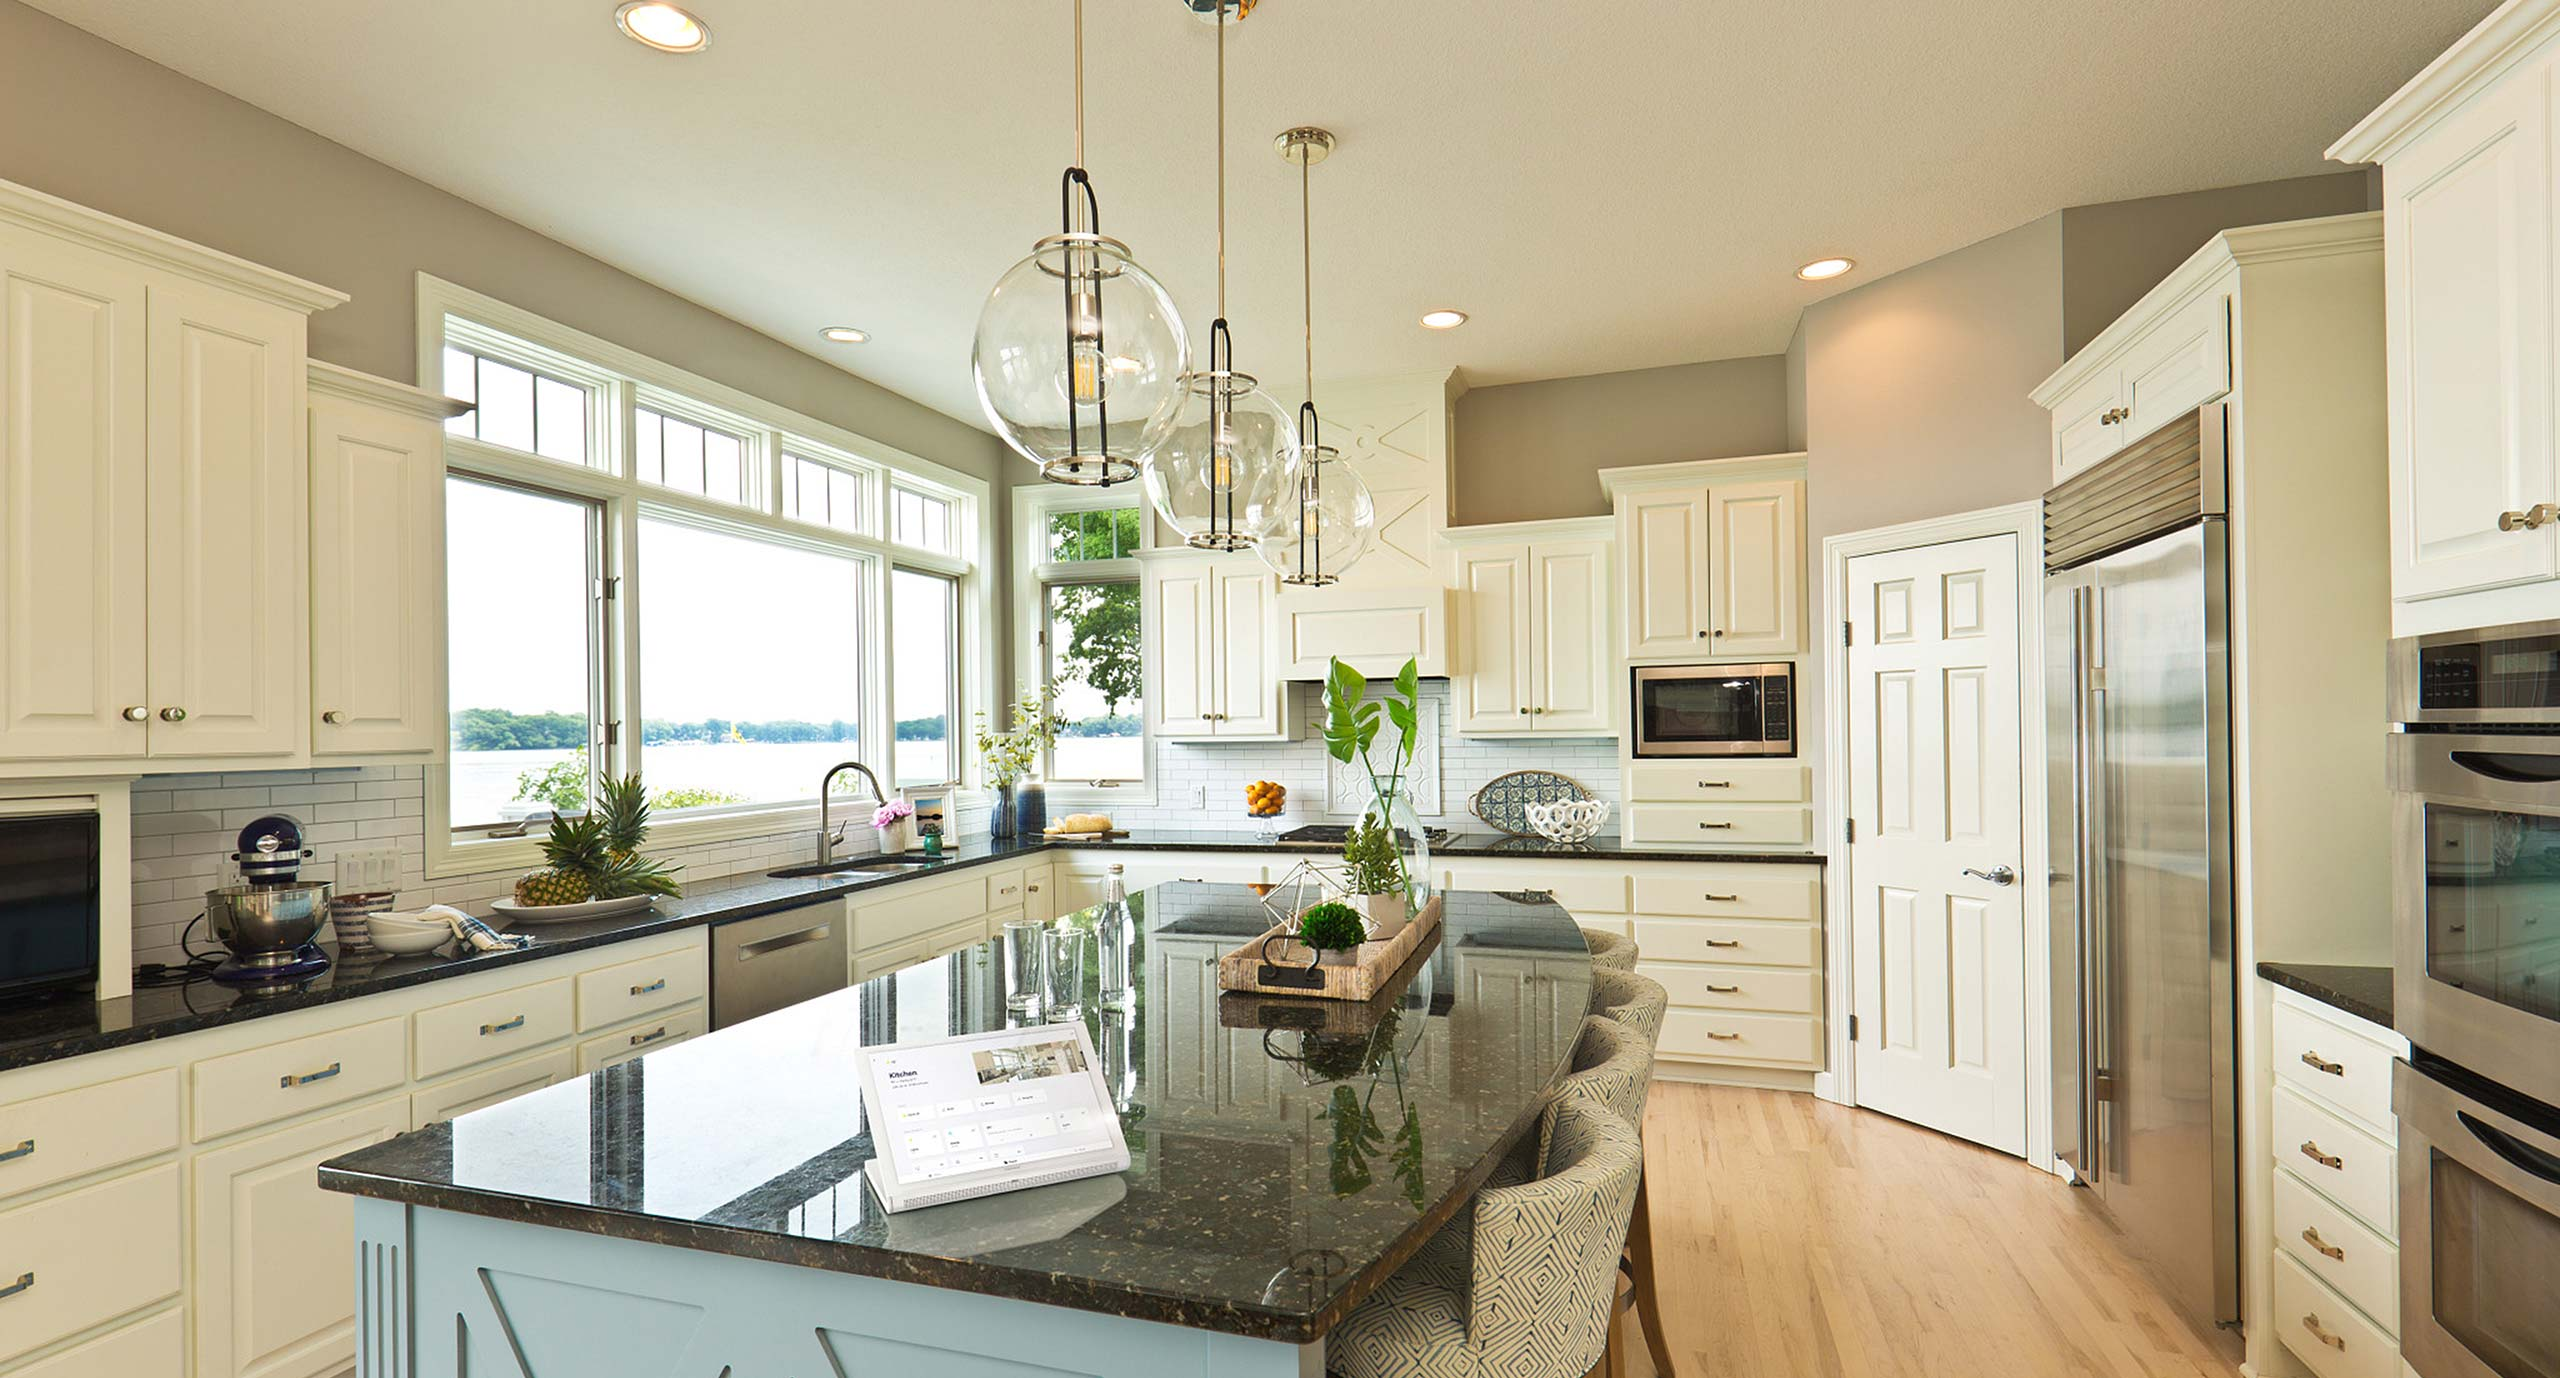 Where to Start When Designing Your Dream Kitchen